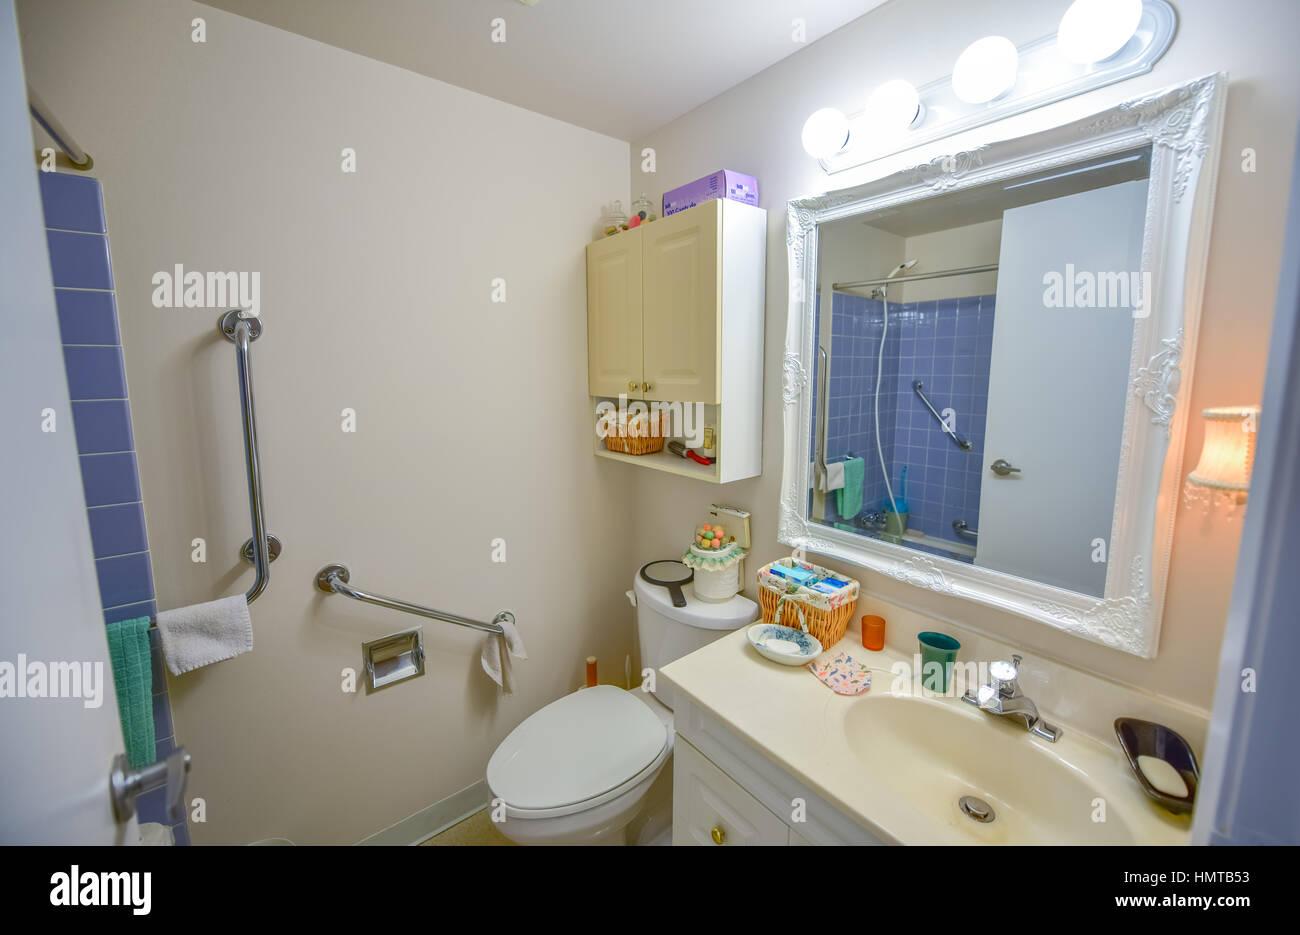 Salle De Bain Futuriste ~ Bathroom Vanity Lights Photos Bathroom Vanity Lights Images Alamy